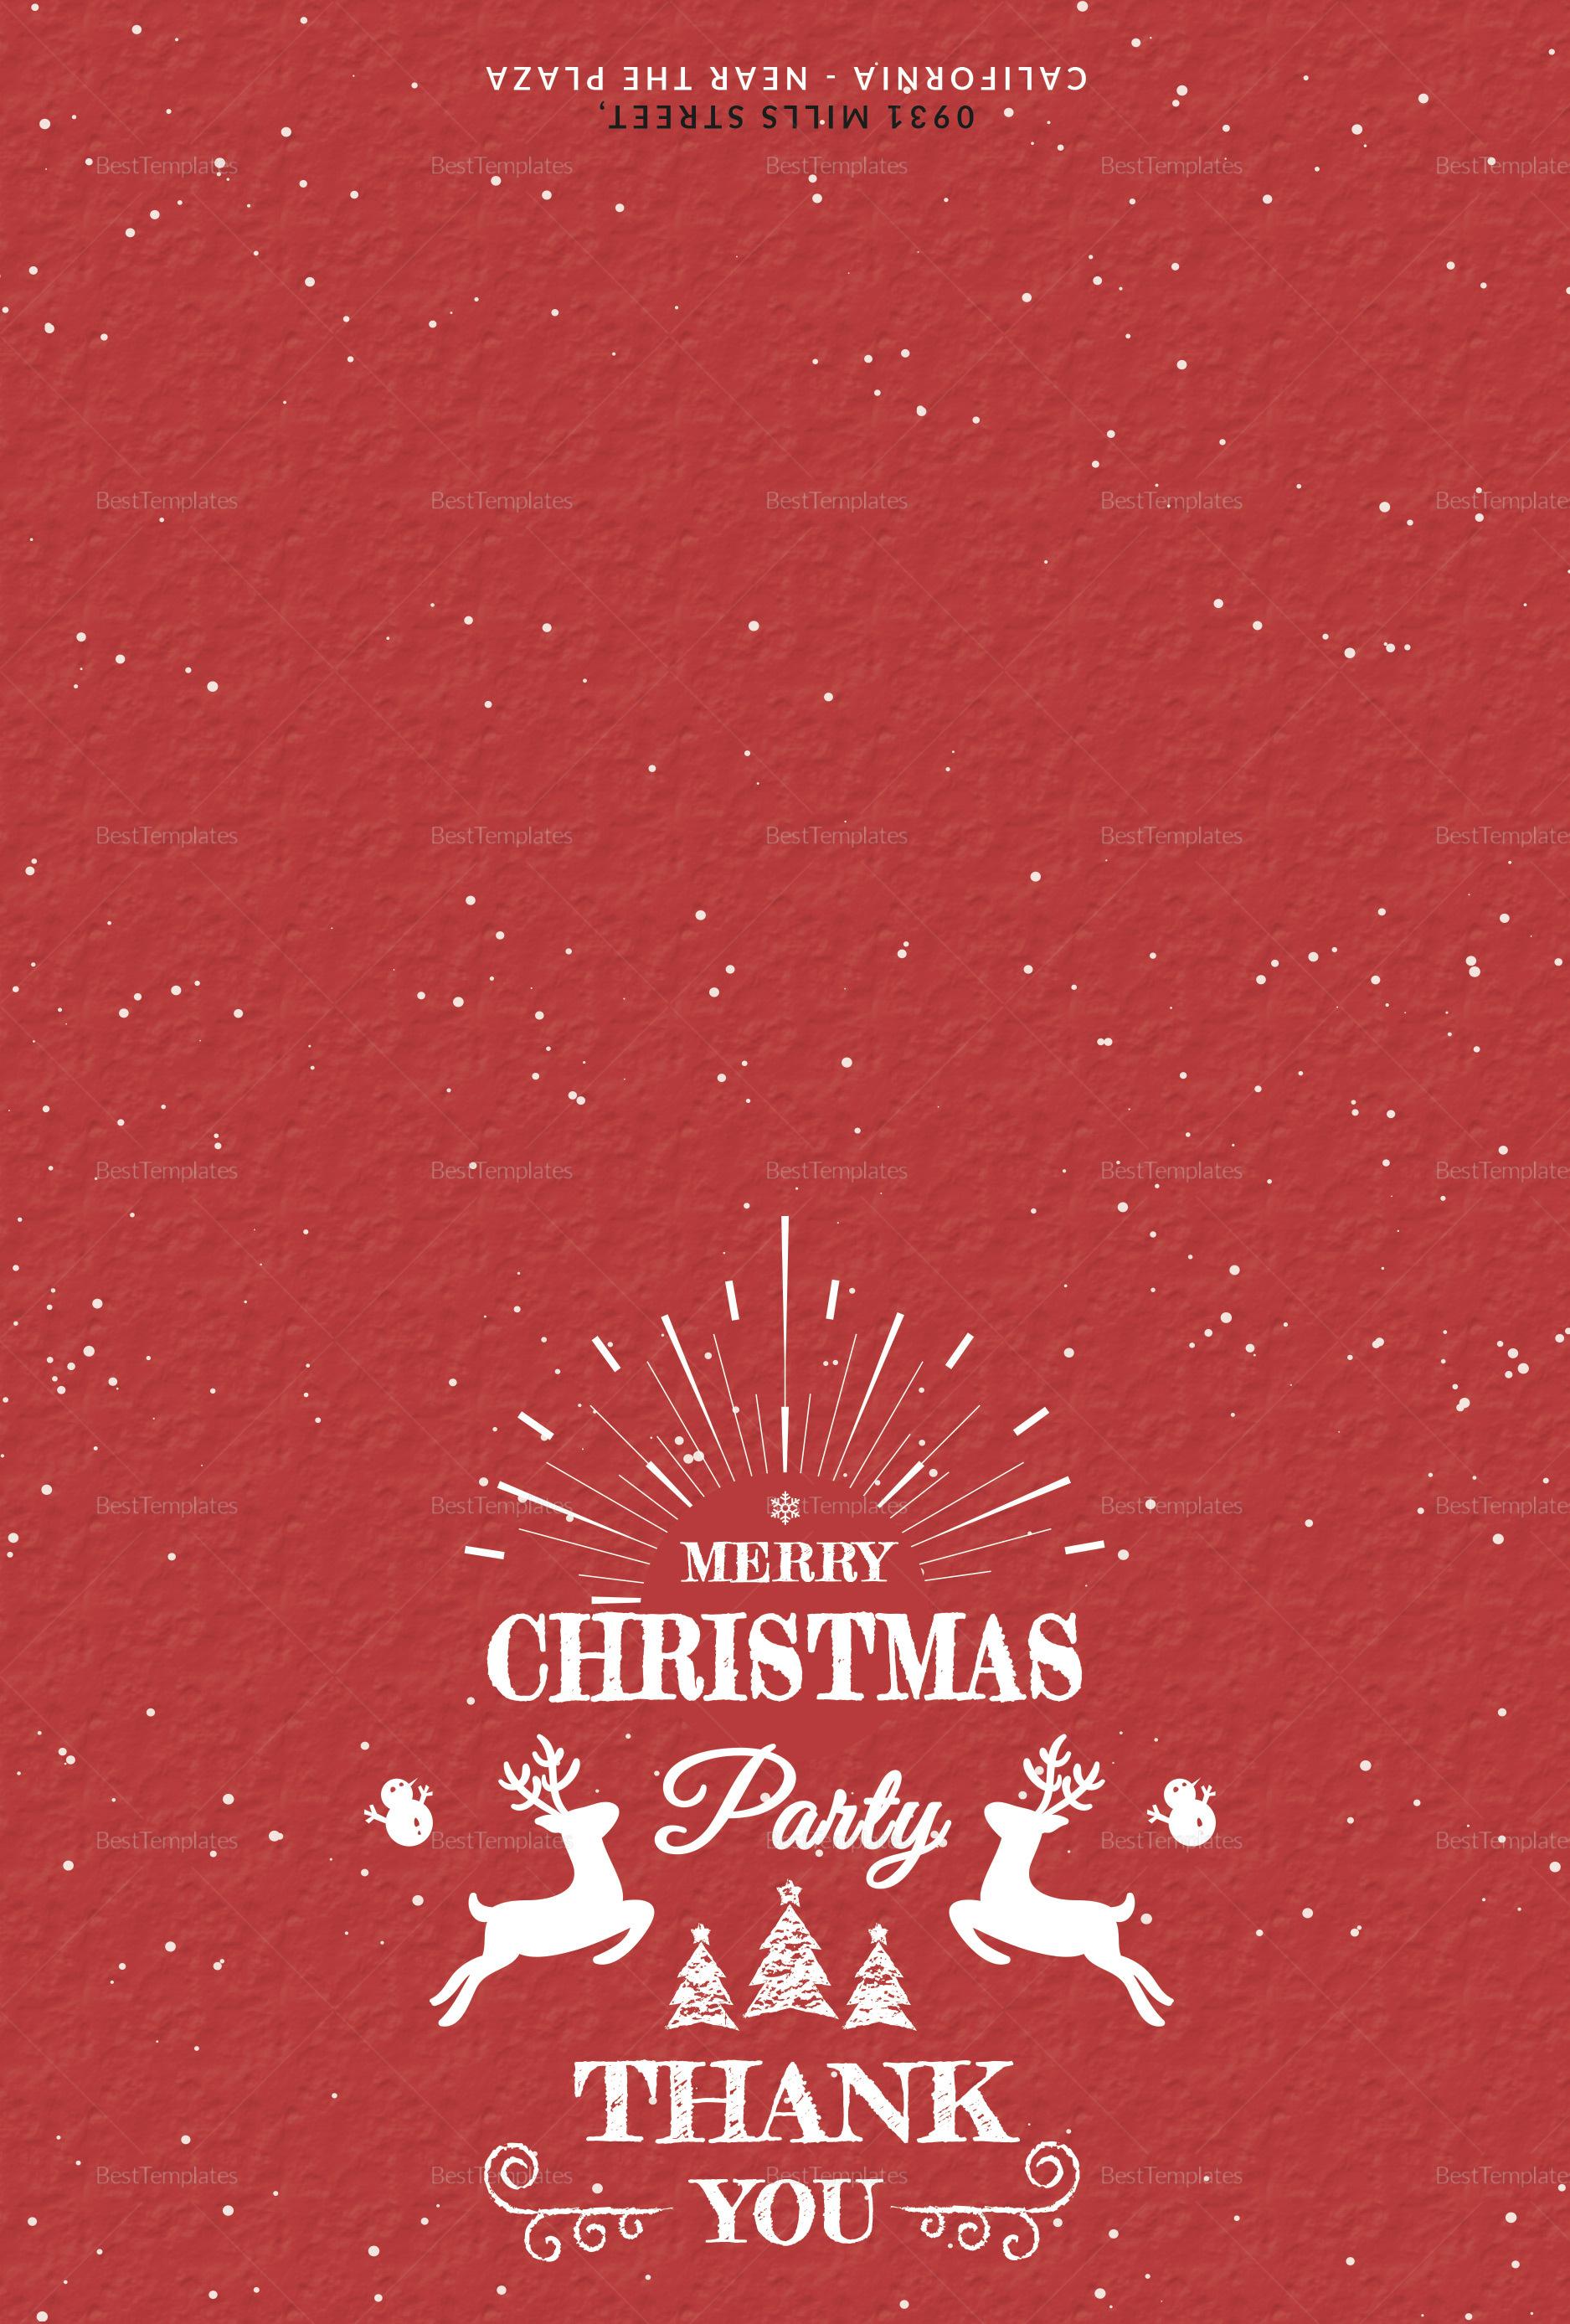 Christmas Holiday Thank You Card